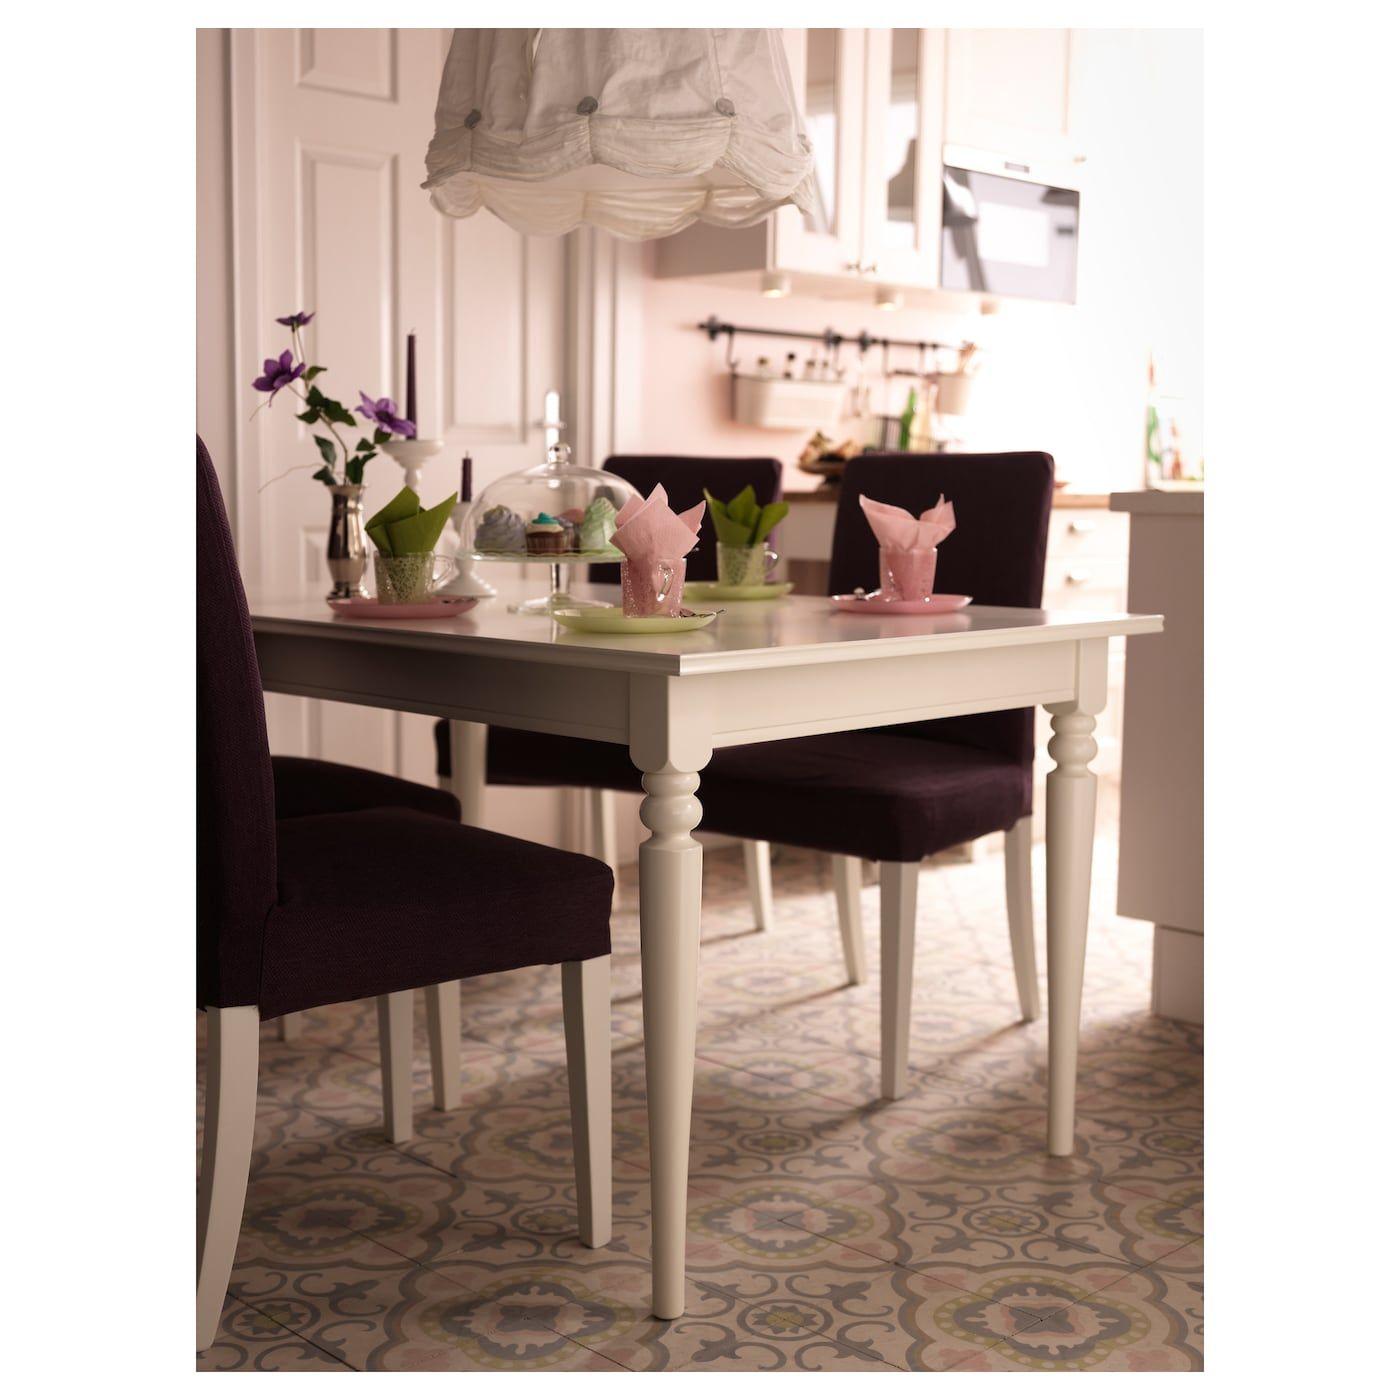 Ingatorp Table Extensible Blanc 155 215x87 Cm Ikea Table A Rallonge Salle A Manger Ikea Table Extensible Blanche